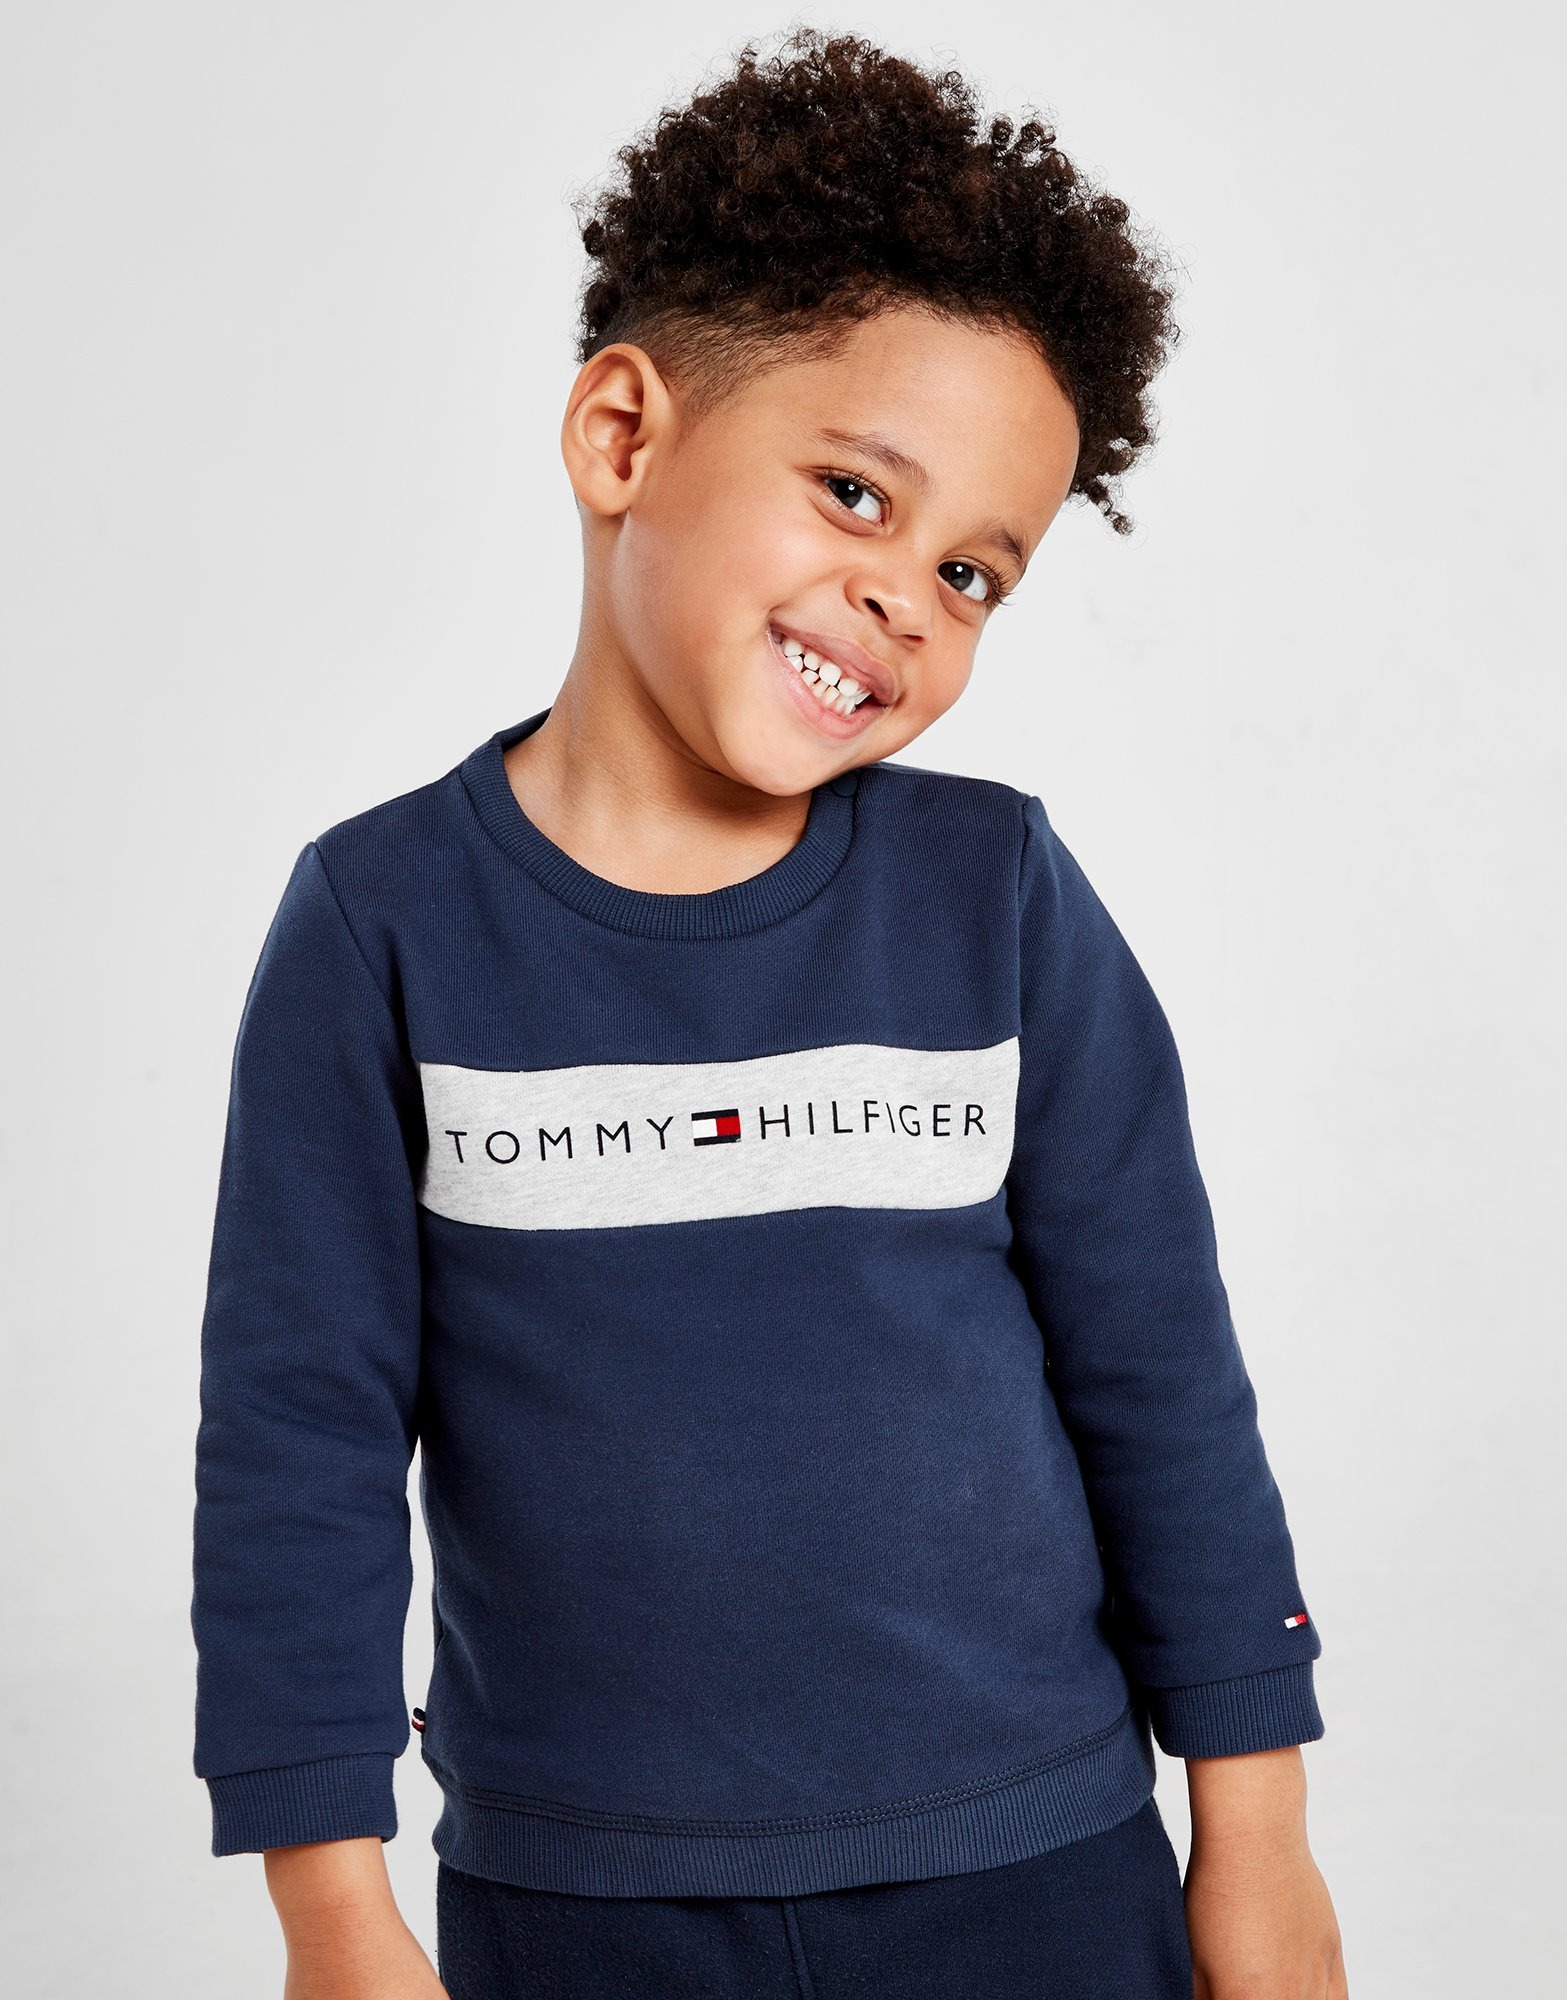 Tommy Hilfiger Logo Crew Sweatshirt Infant by Tommy Hilfiger